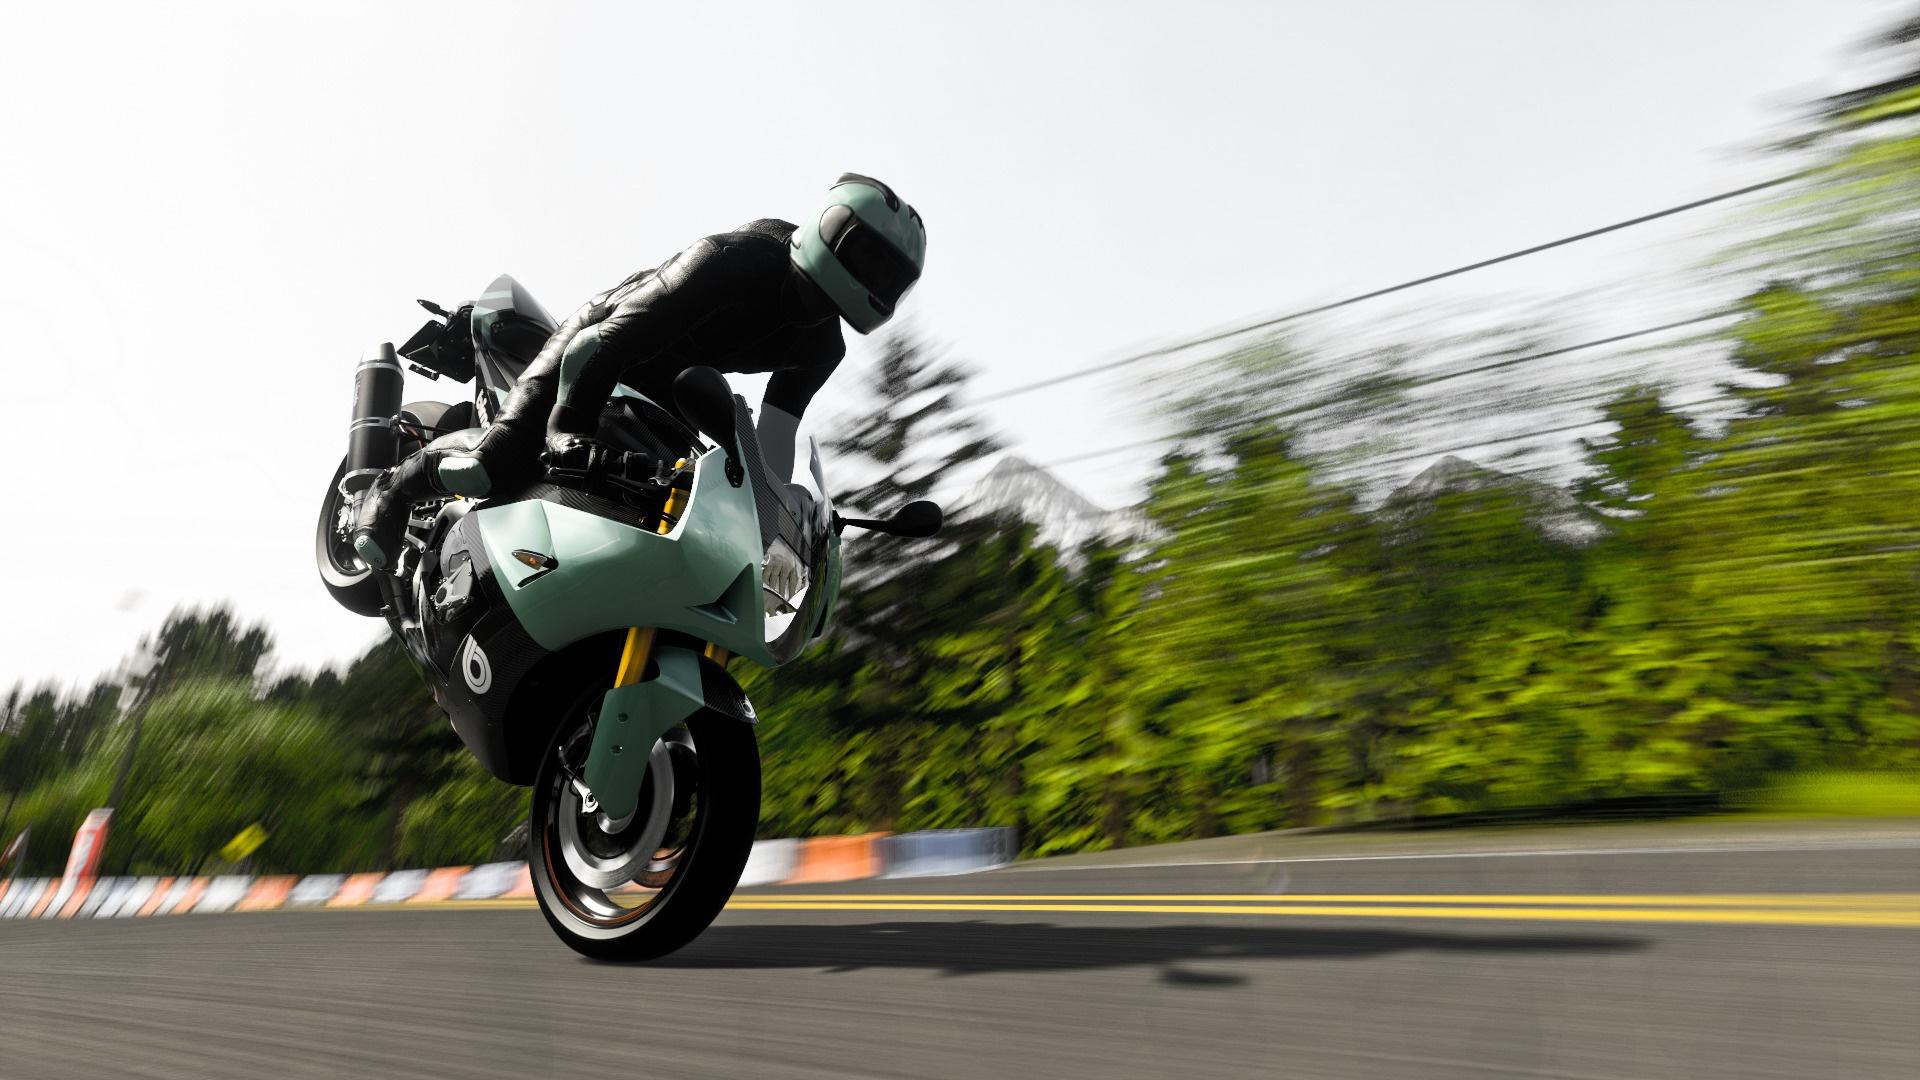 Картинки дрифта мотоциклов